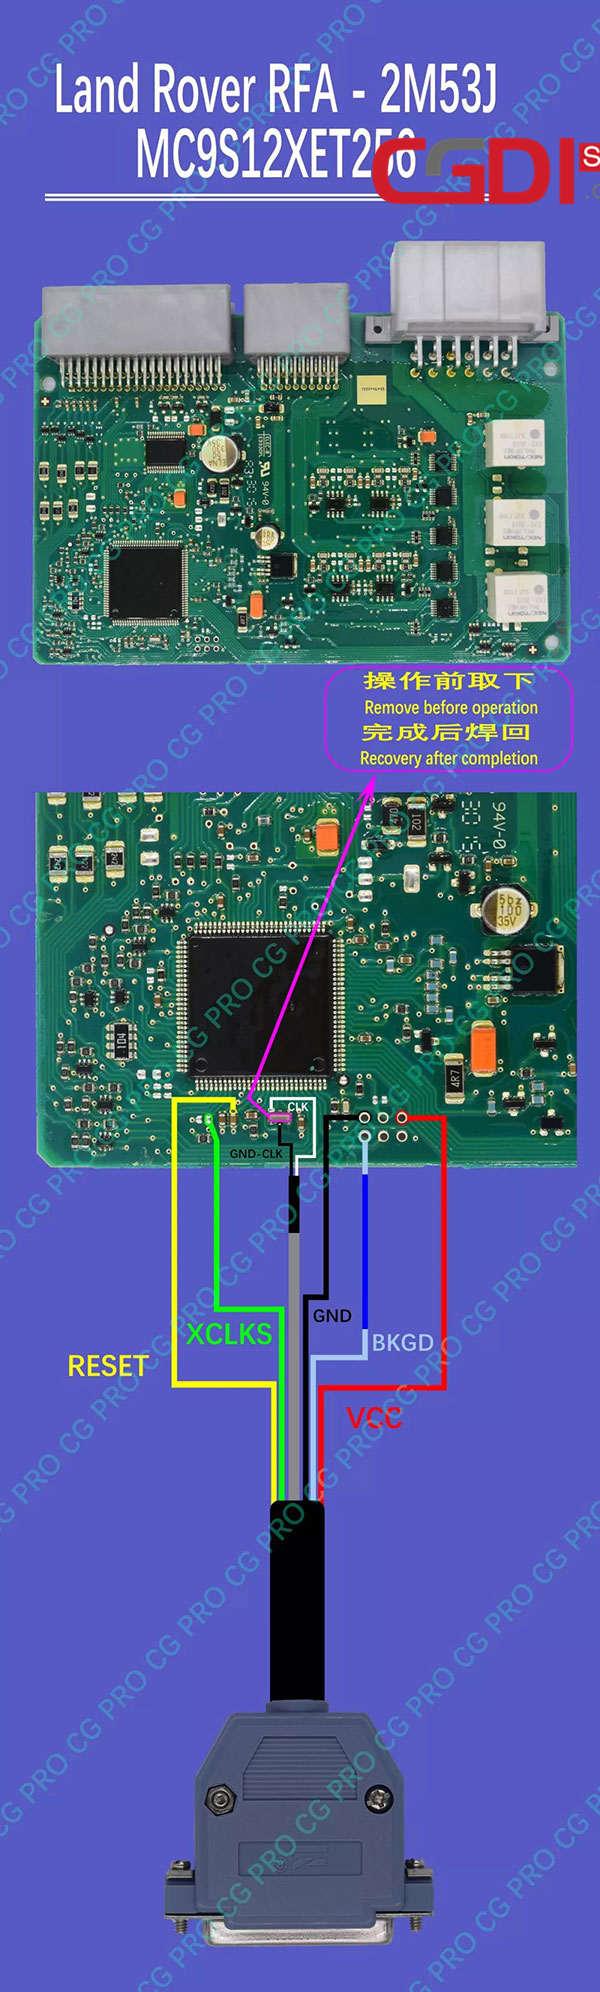 cg-pro-9s12-read-write-land-rover-rfa-8